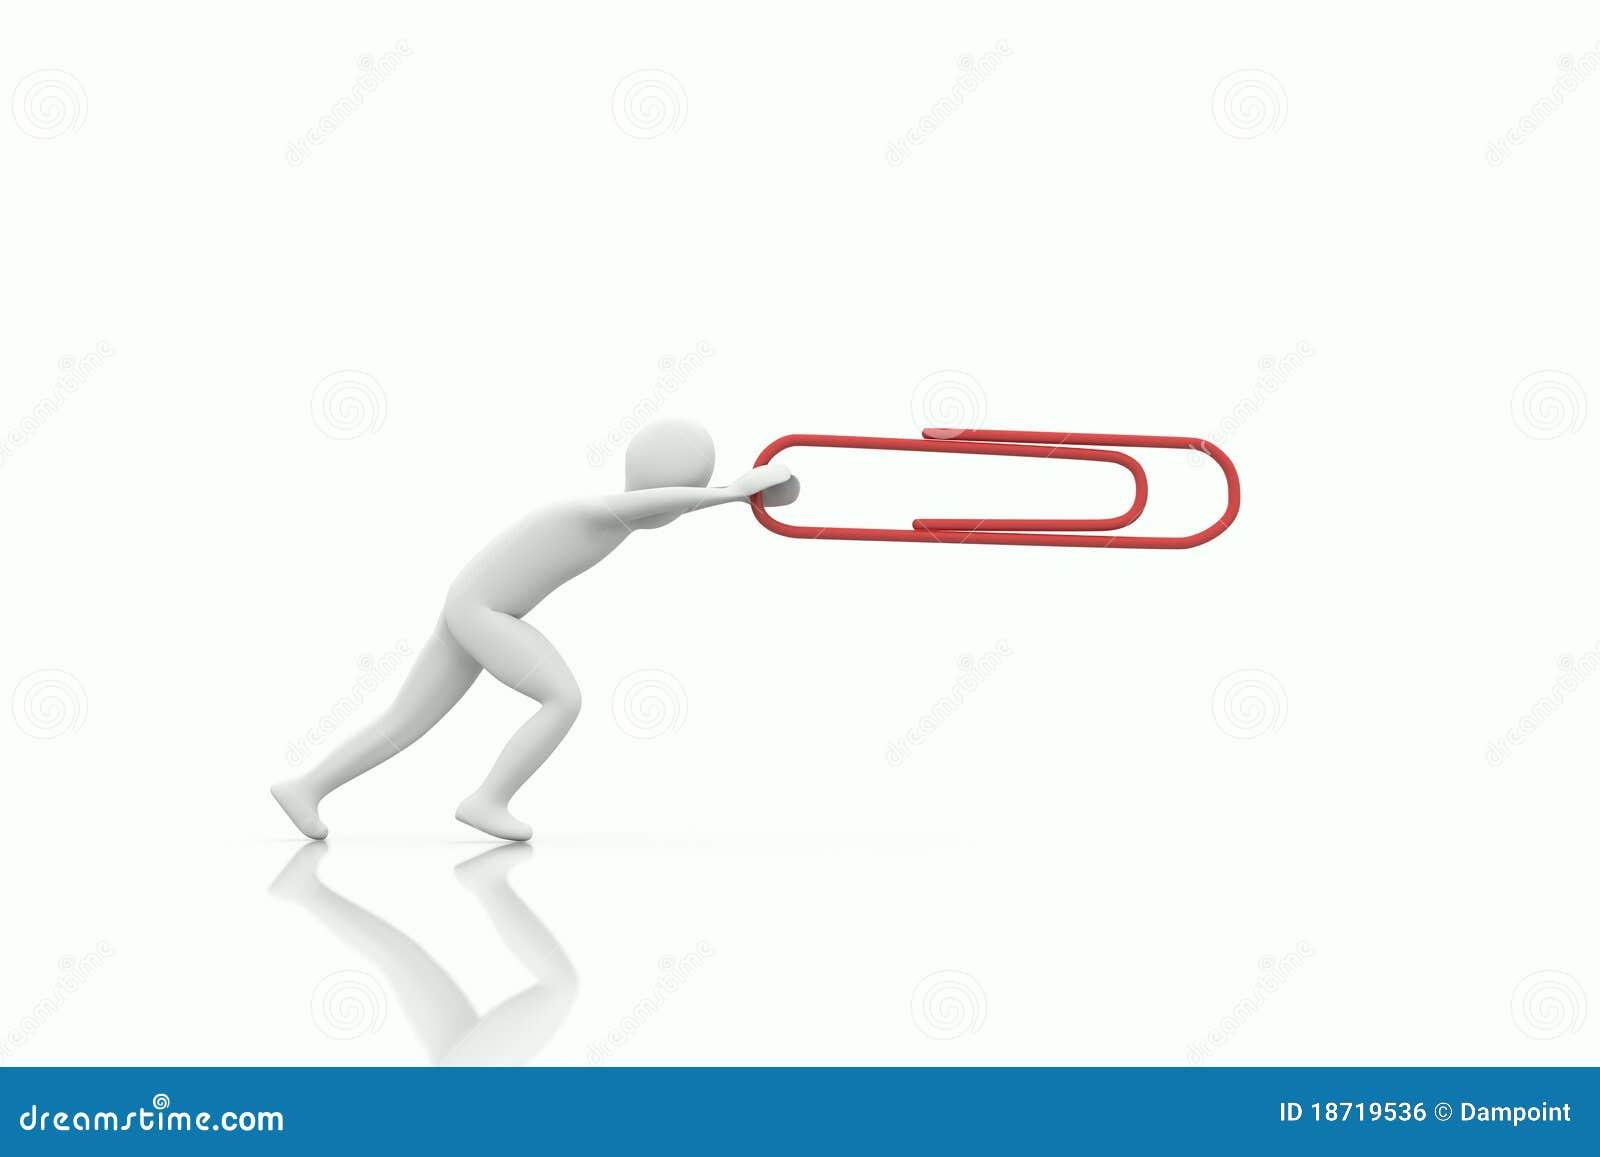 3d Human Push A Big Paper Clip Royalty Free Stock Image - Image ...